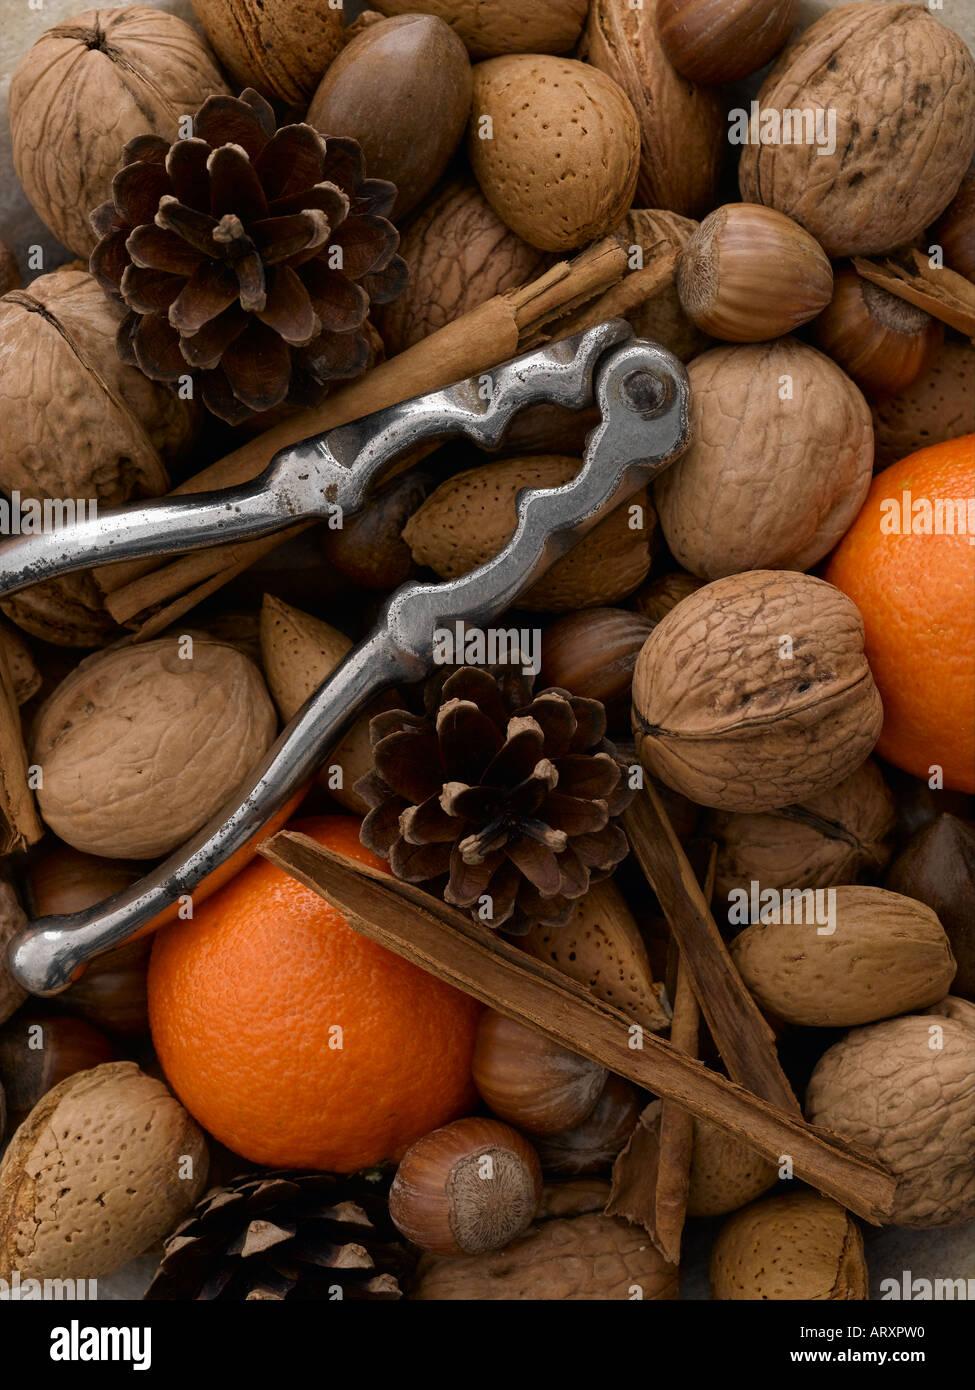 Mixed nuts satsumas cinnamon sticks and nut crackers - Stock Image